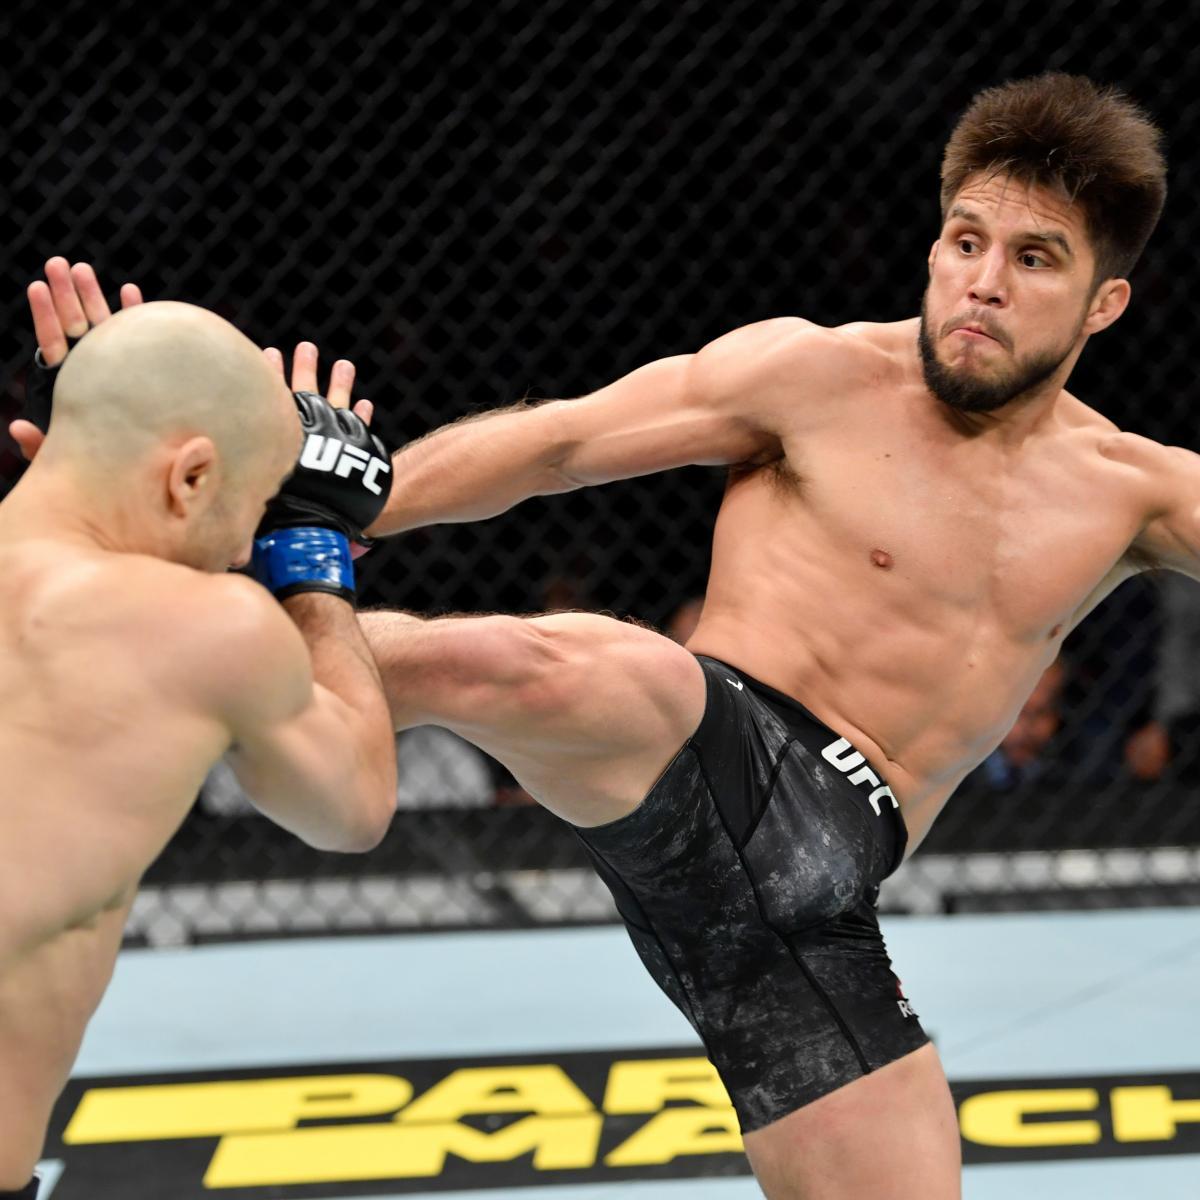 UFC 238 Results: Henry Cejudo TKO, Valentina Shevchenko